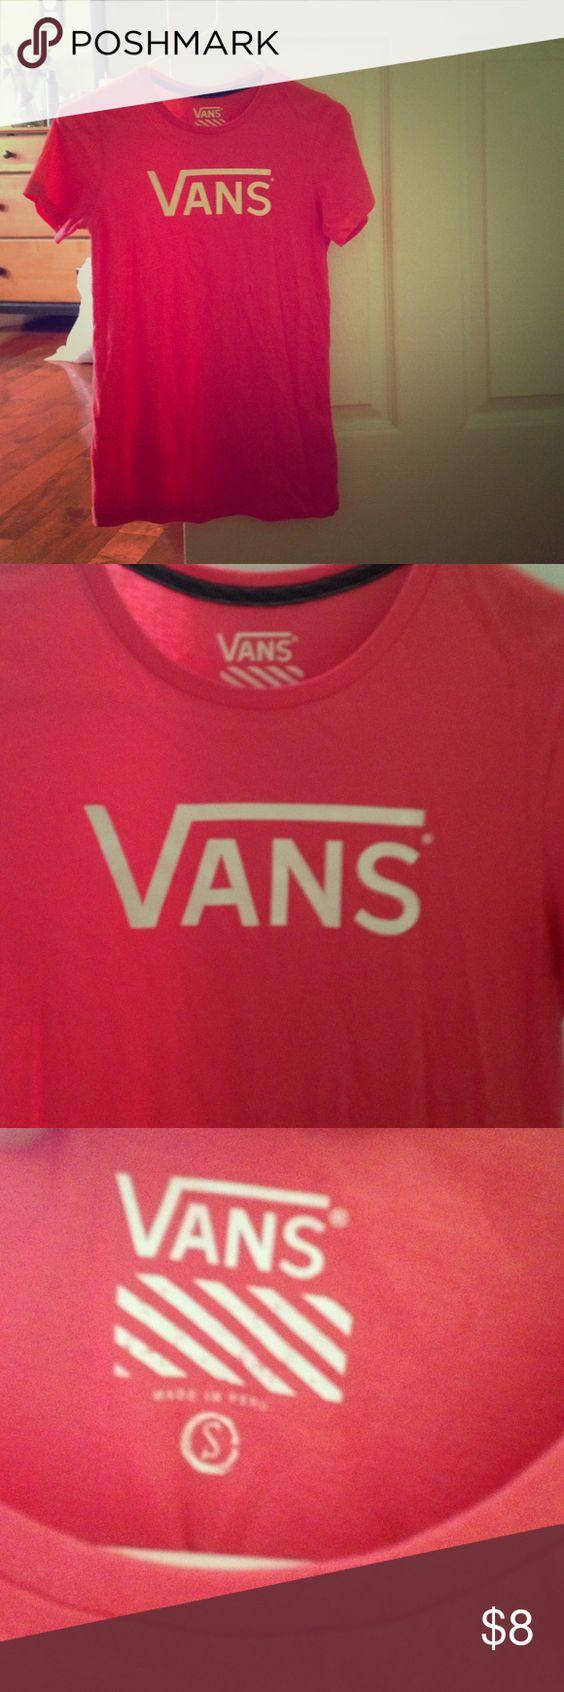 Vans t shirt Vans t shirt.  worn twice, great condition, size small Vans Tops Tees - Short Sleeve